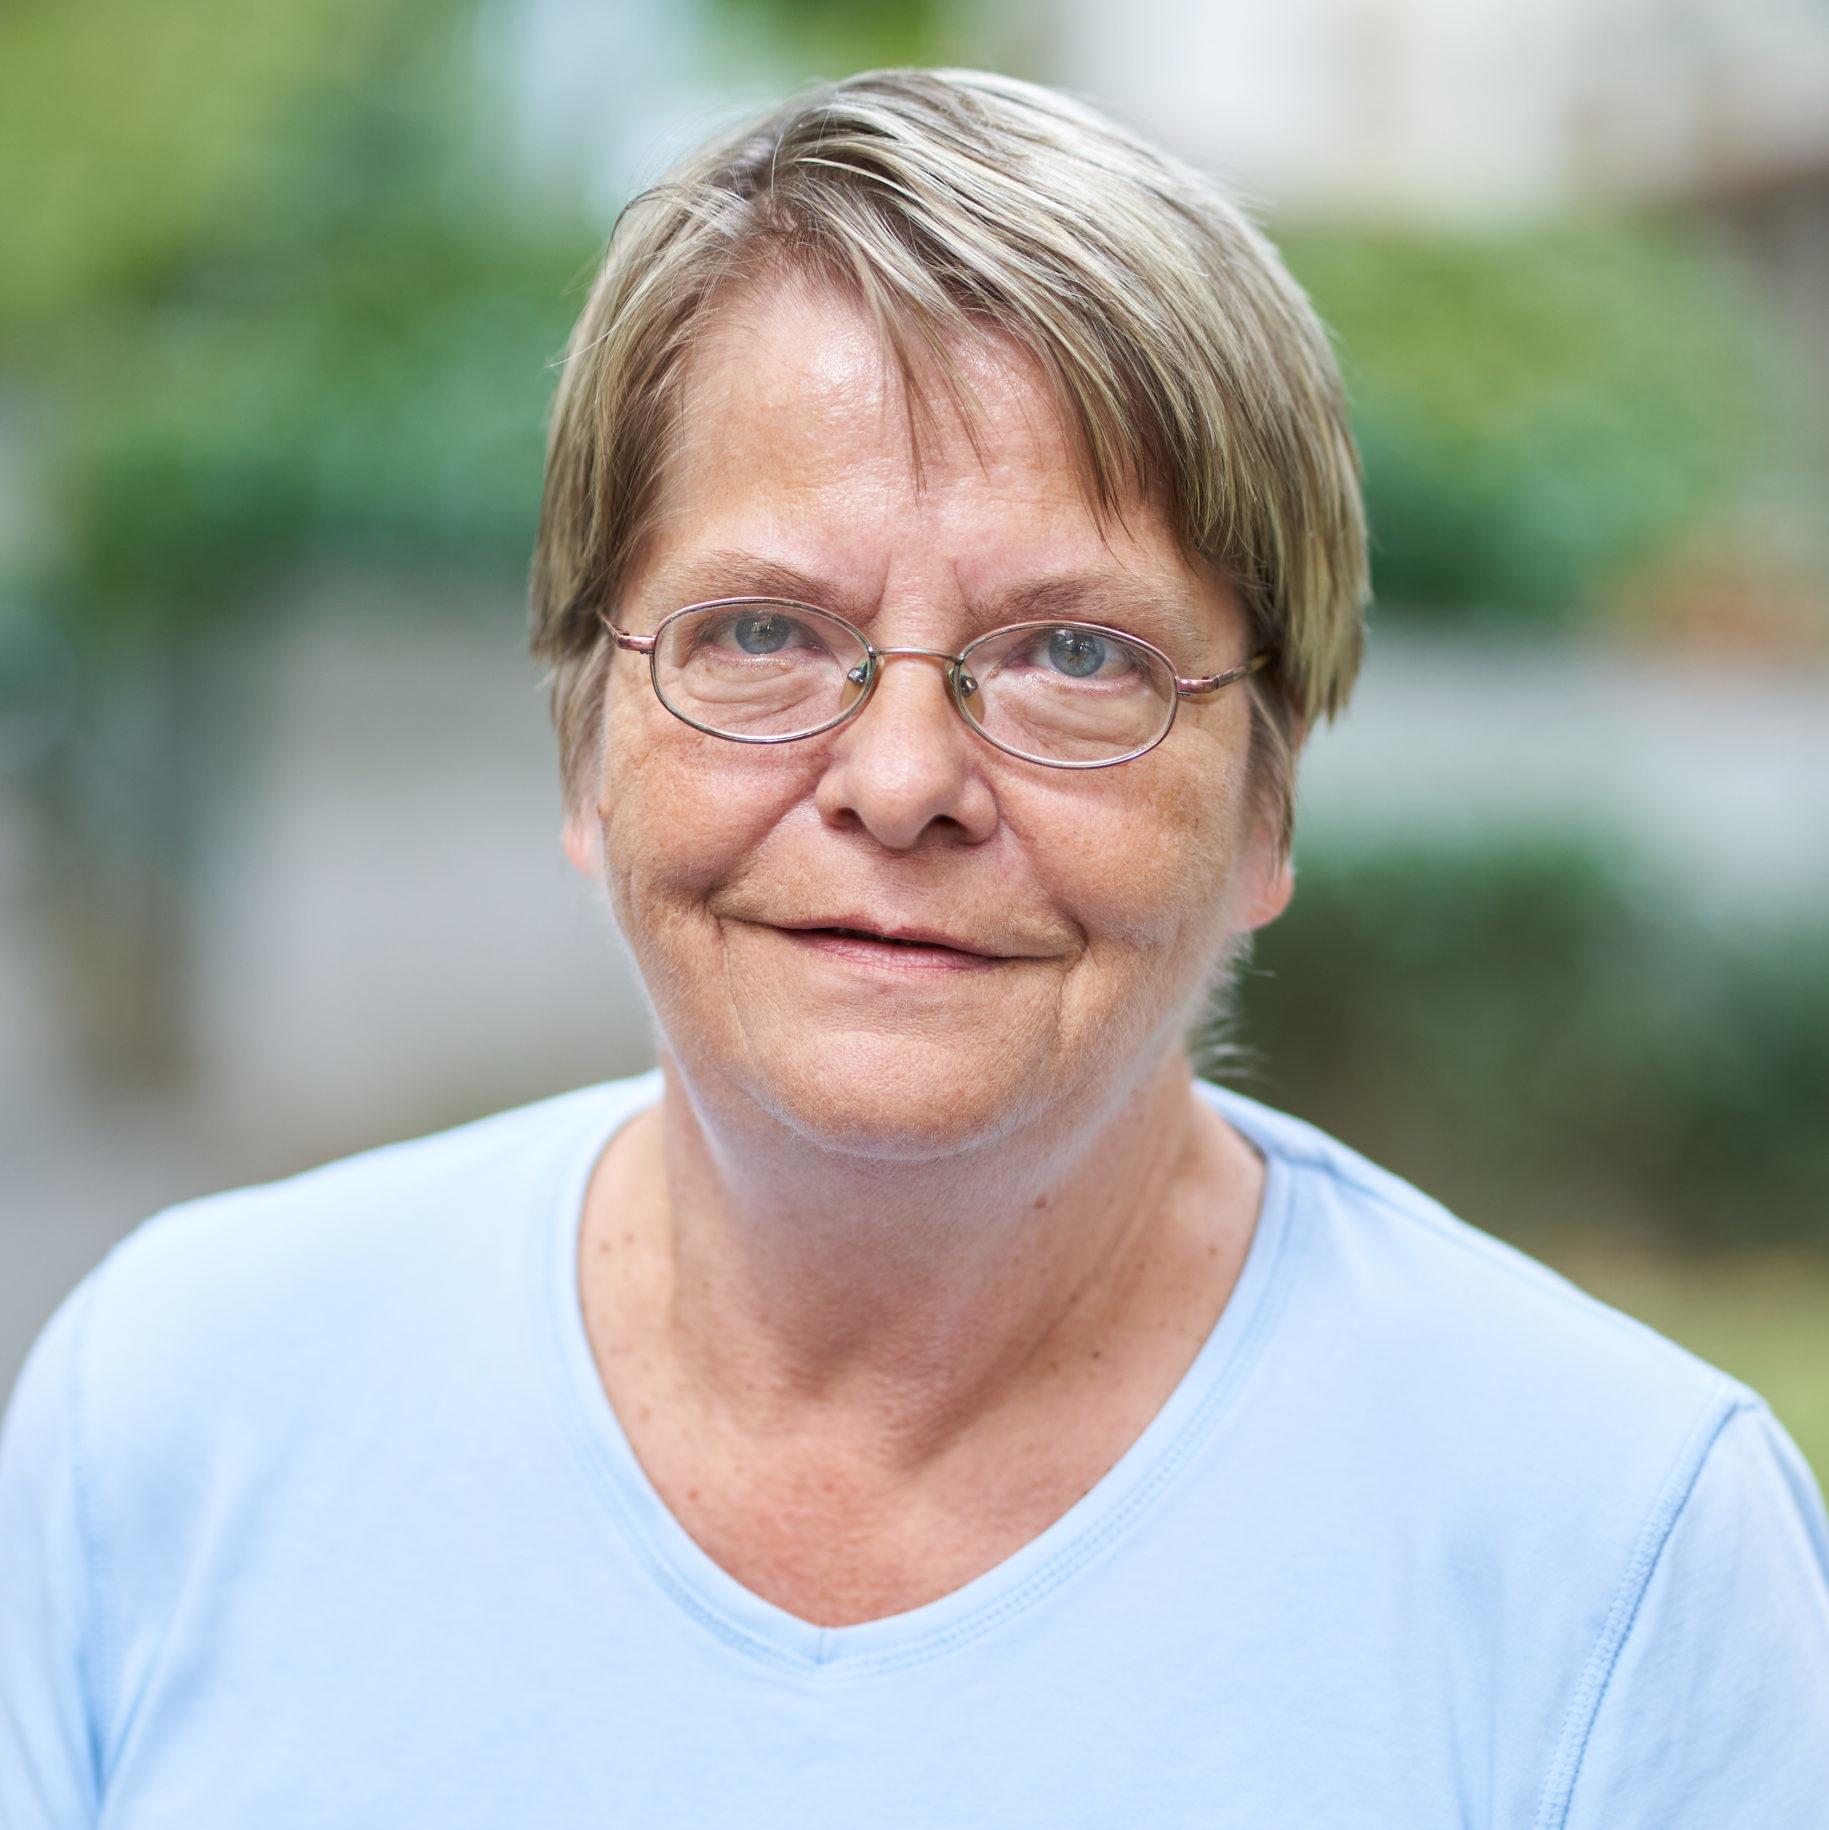 Birgit Seidel